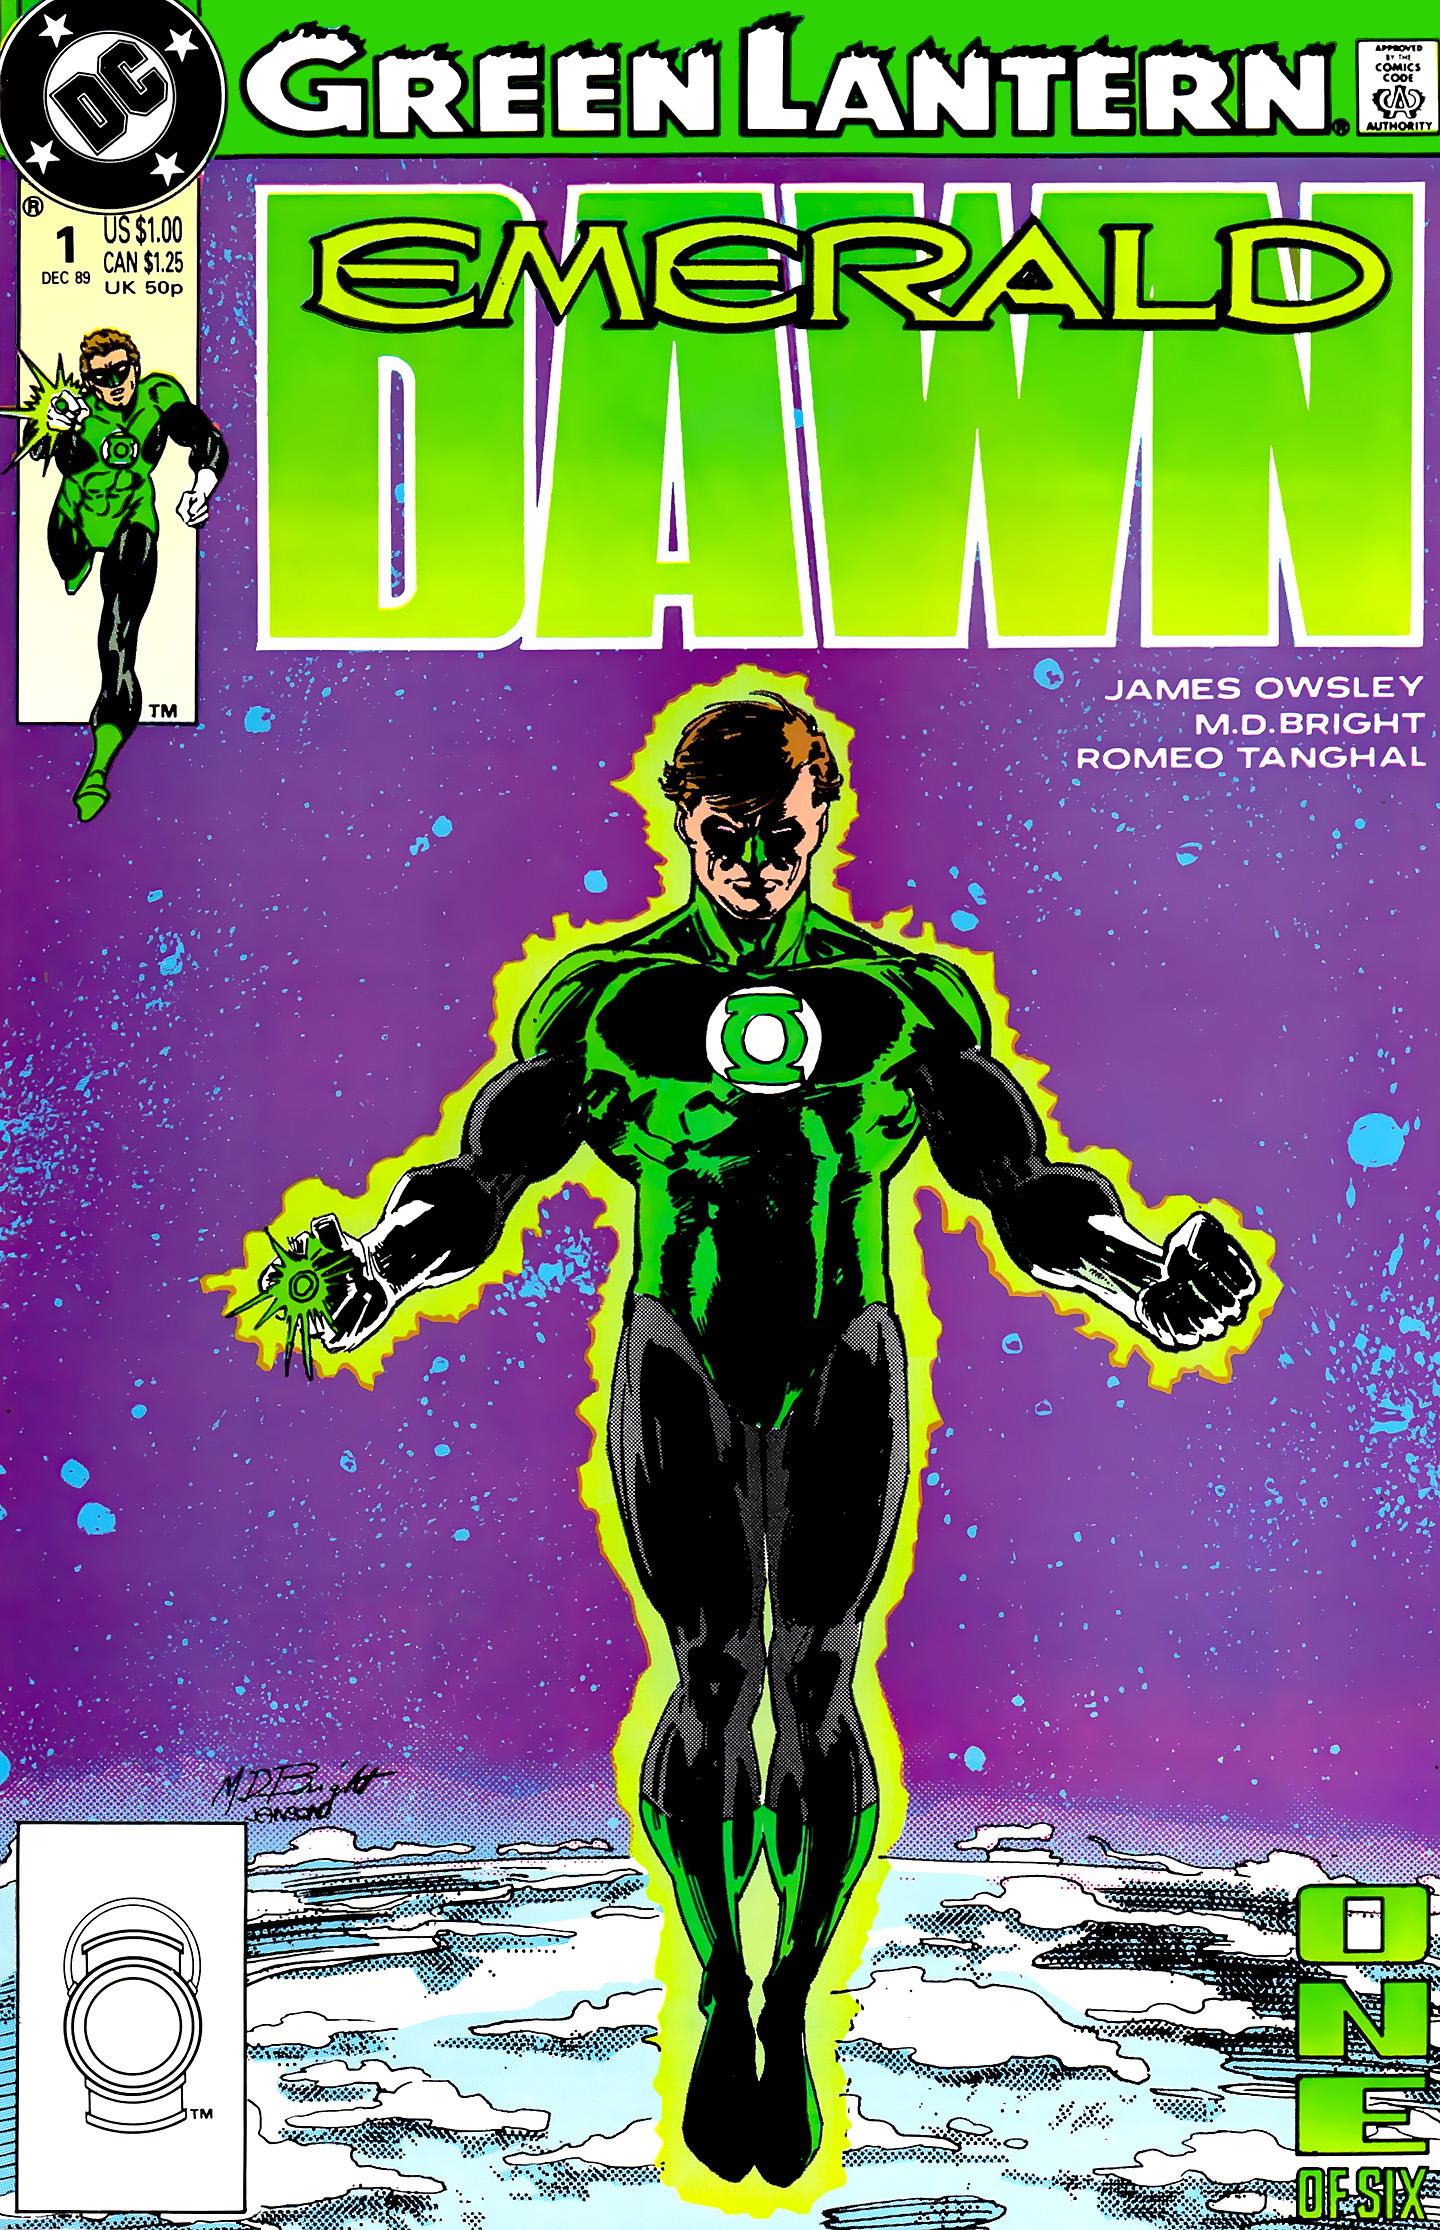 Green Lantern: Emerald Dawn 1 Page 1